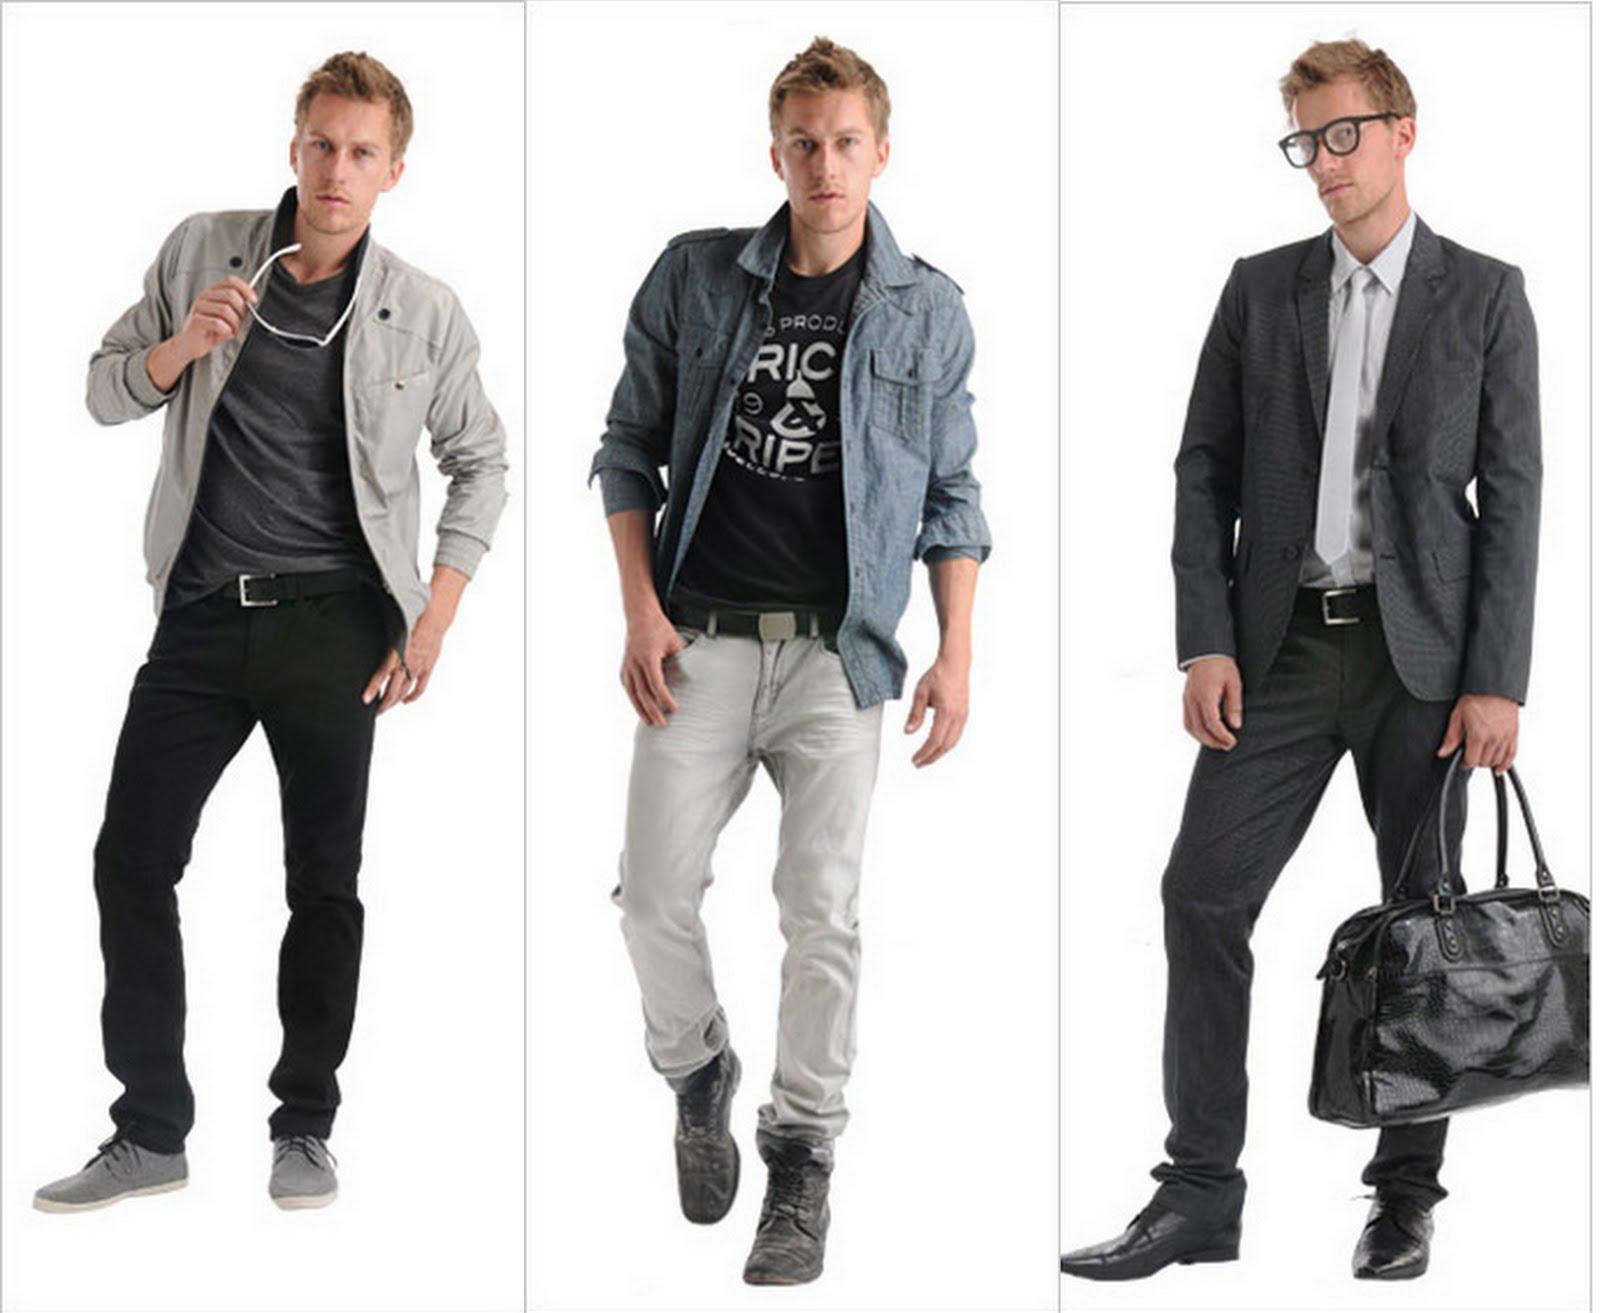 بالصور ملابس رجال , كيف اختار ملابس رجال 5211 5